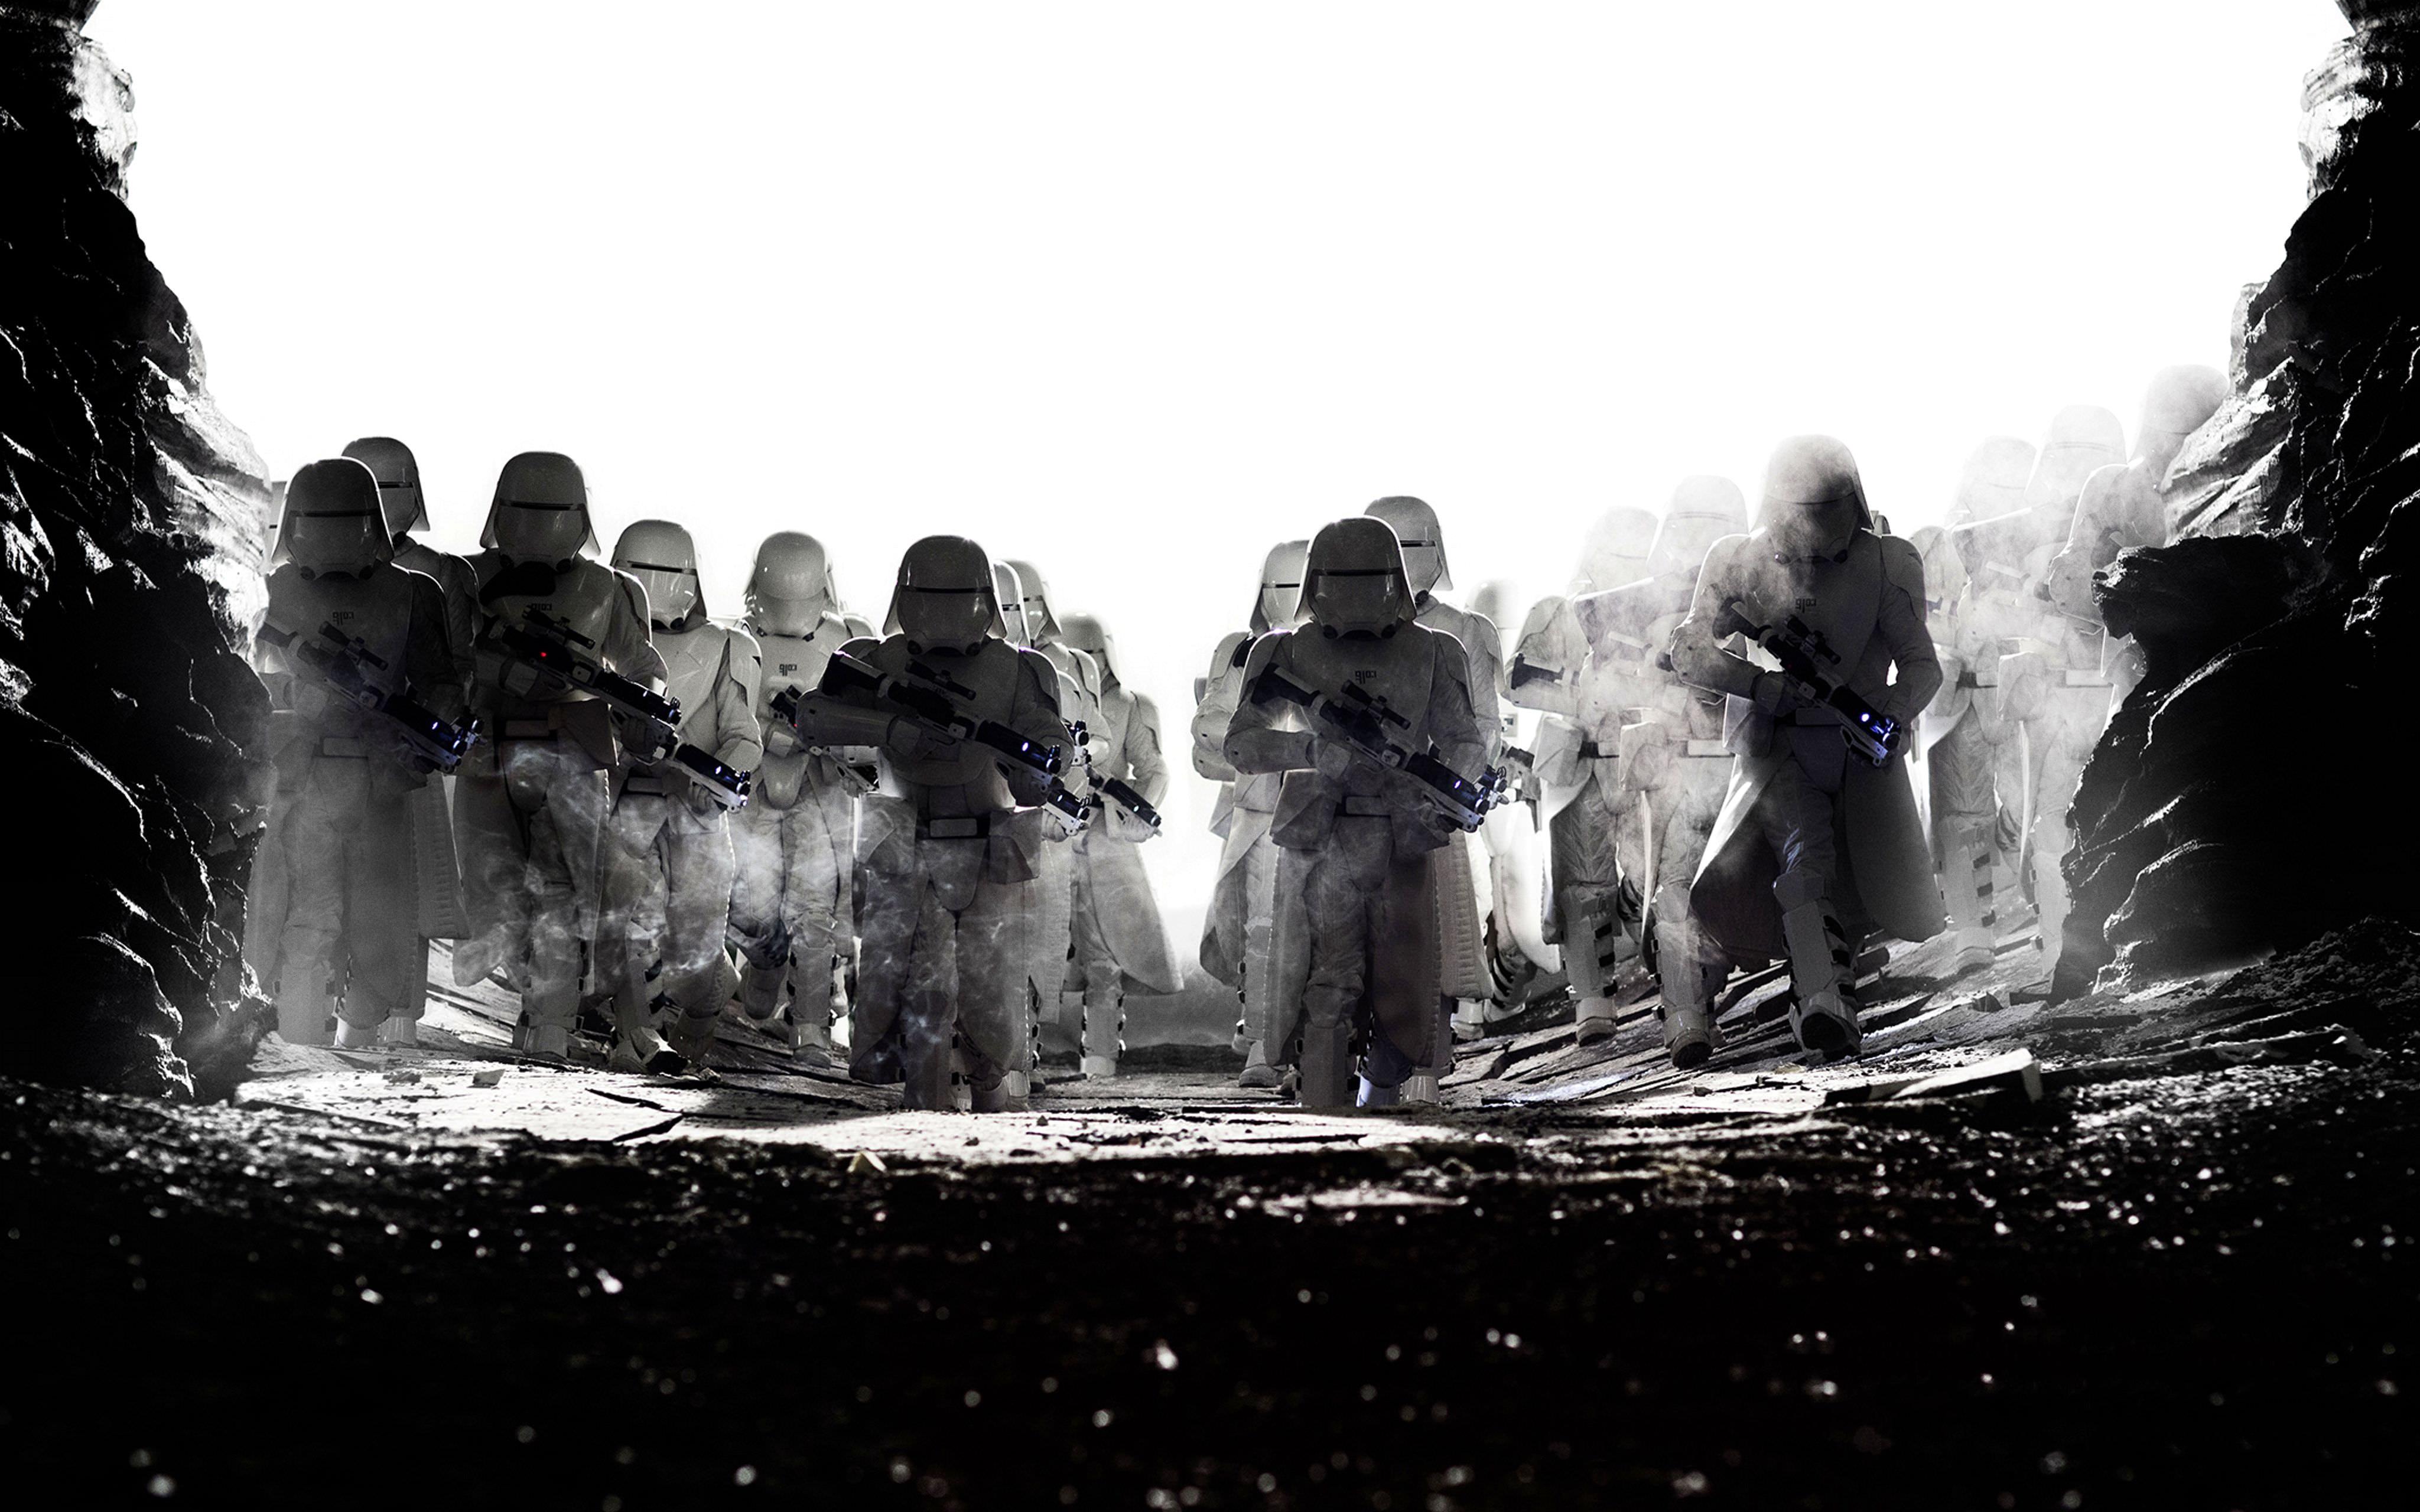 Wallpaper Star Wars: The Last Jedi Clone trooper film Black and white 4096x2560 Movies